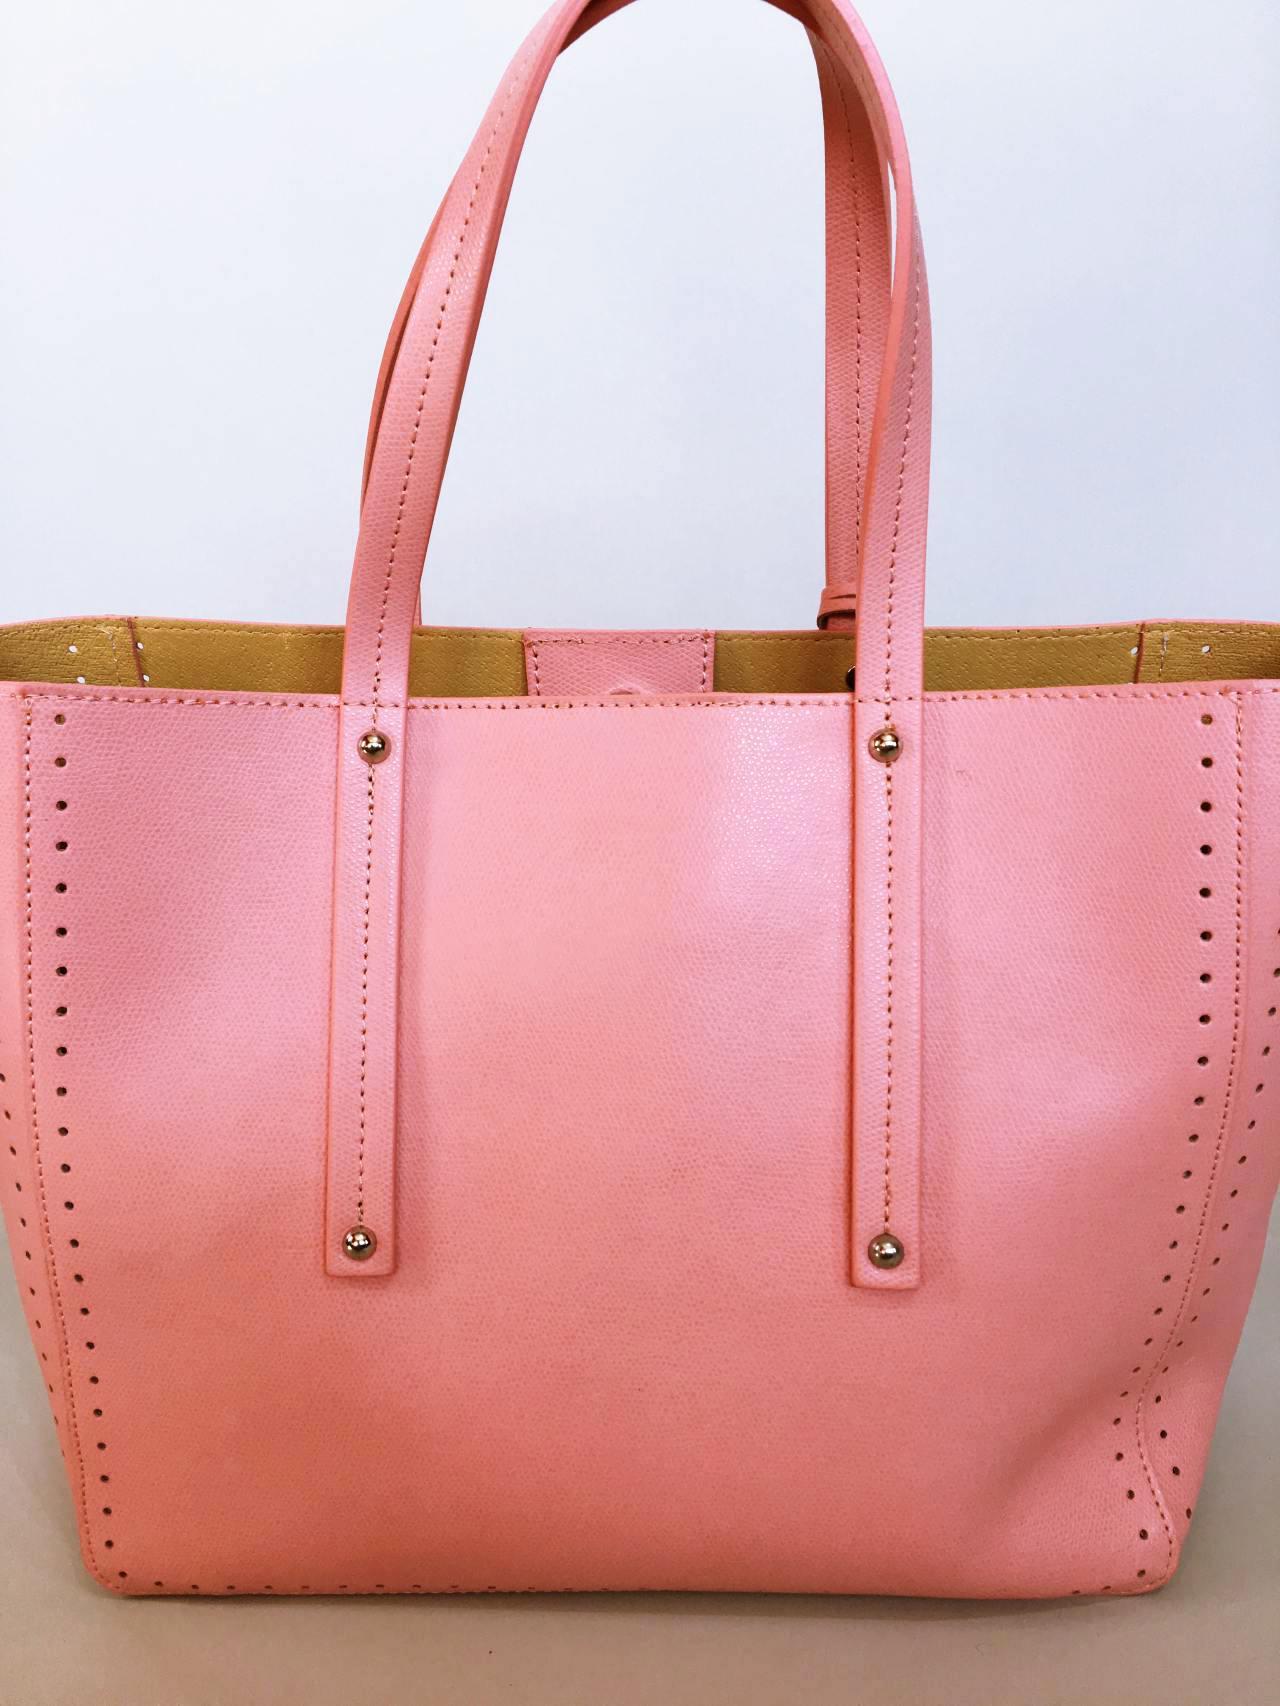 Kožená kabelka Bia růžová 04